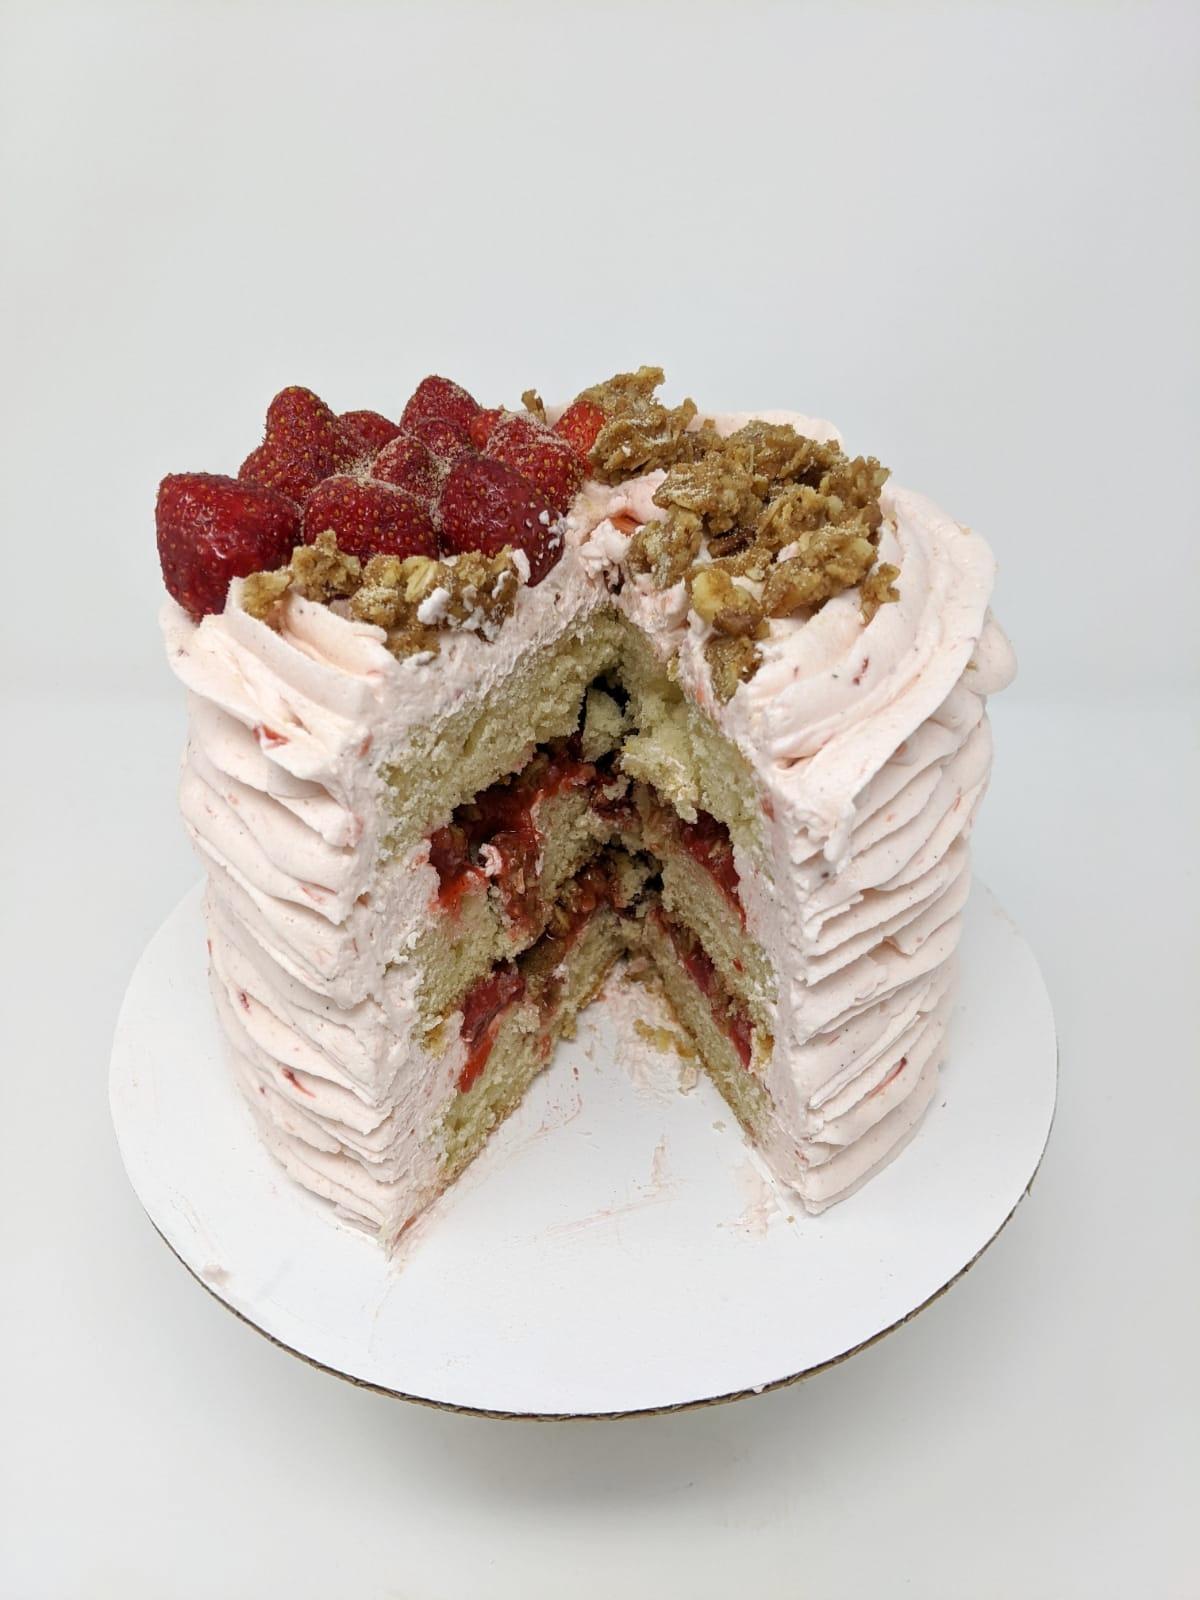 Vegan Strawberry Rhubarb Crumble Layer Cake Cut